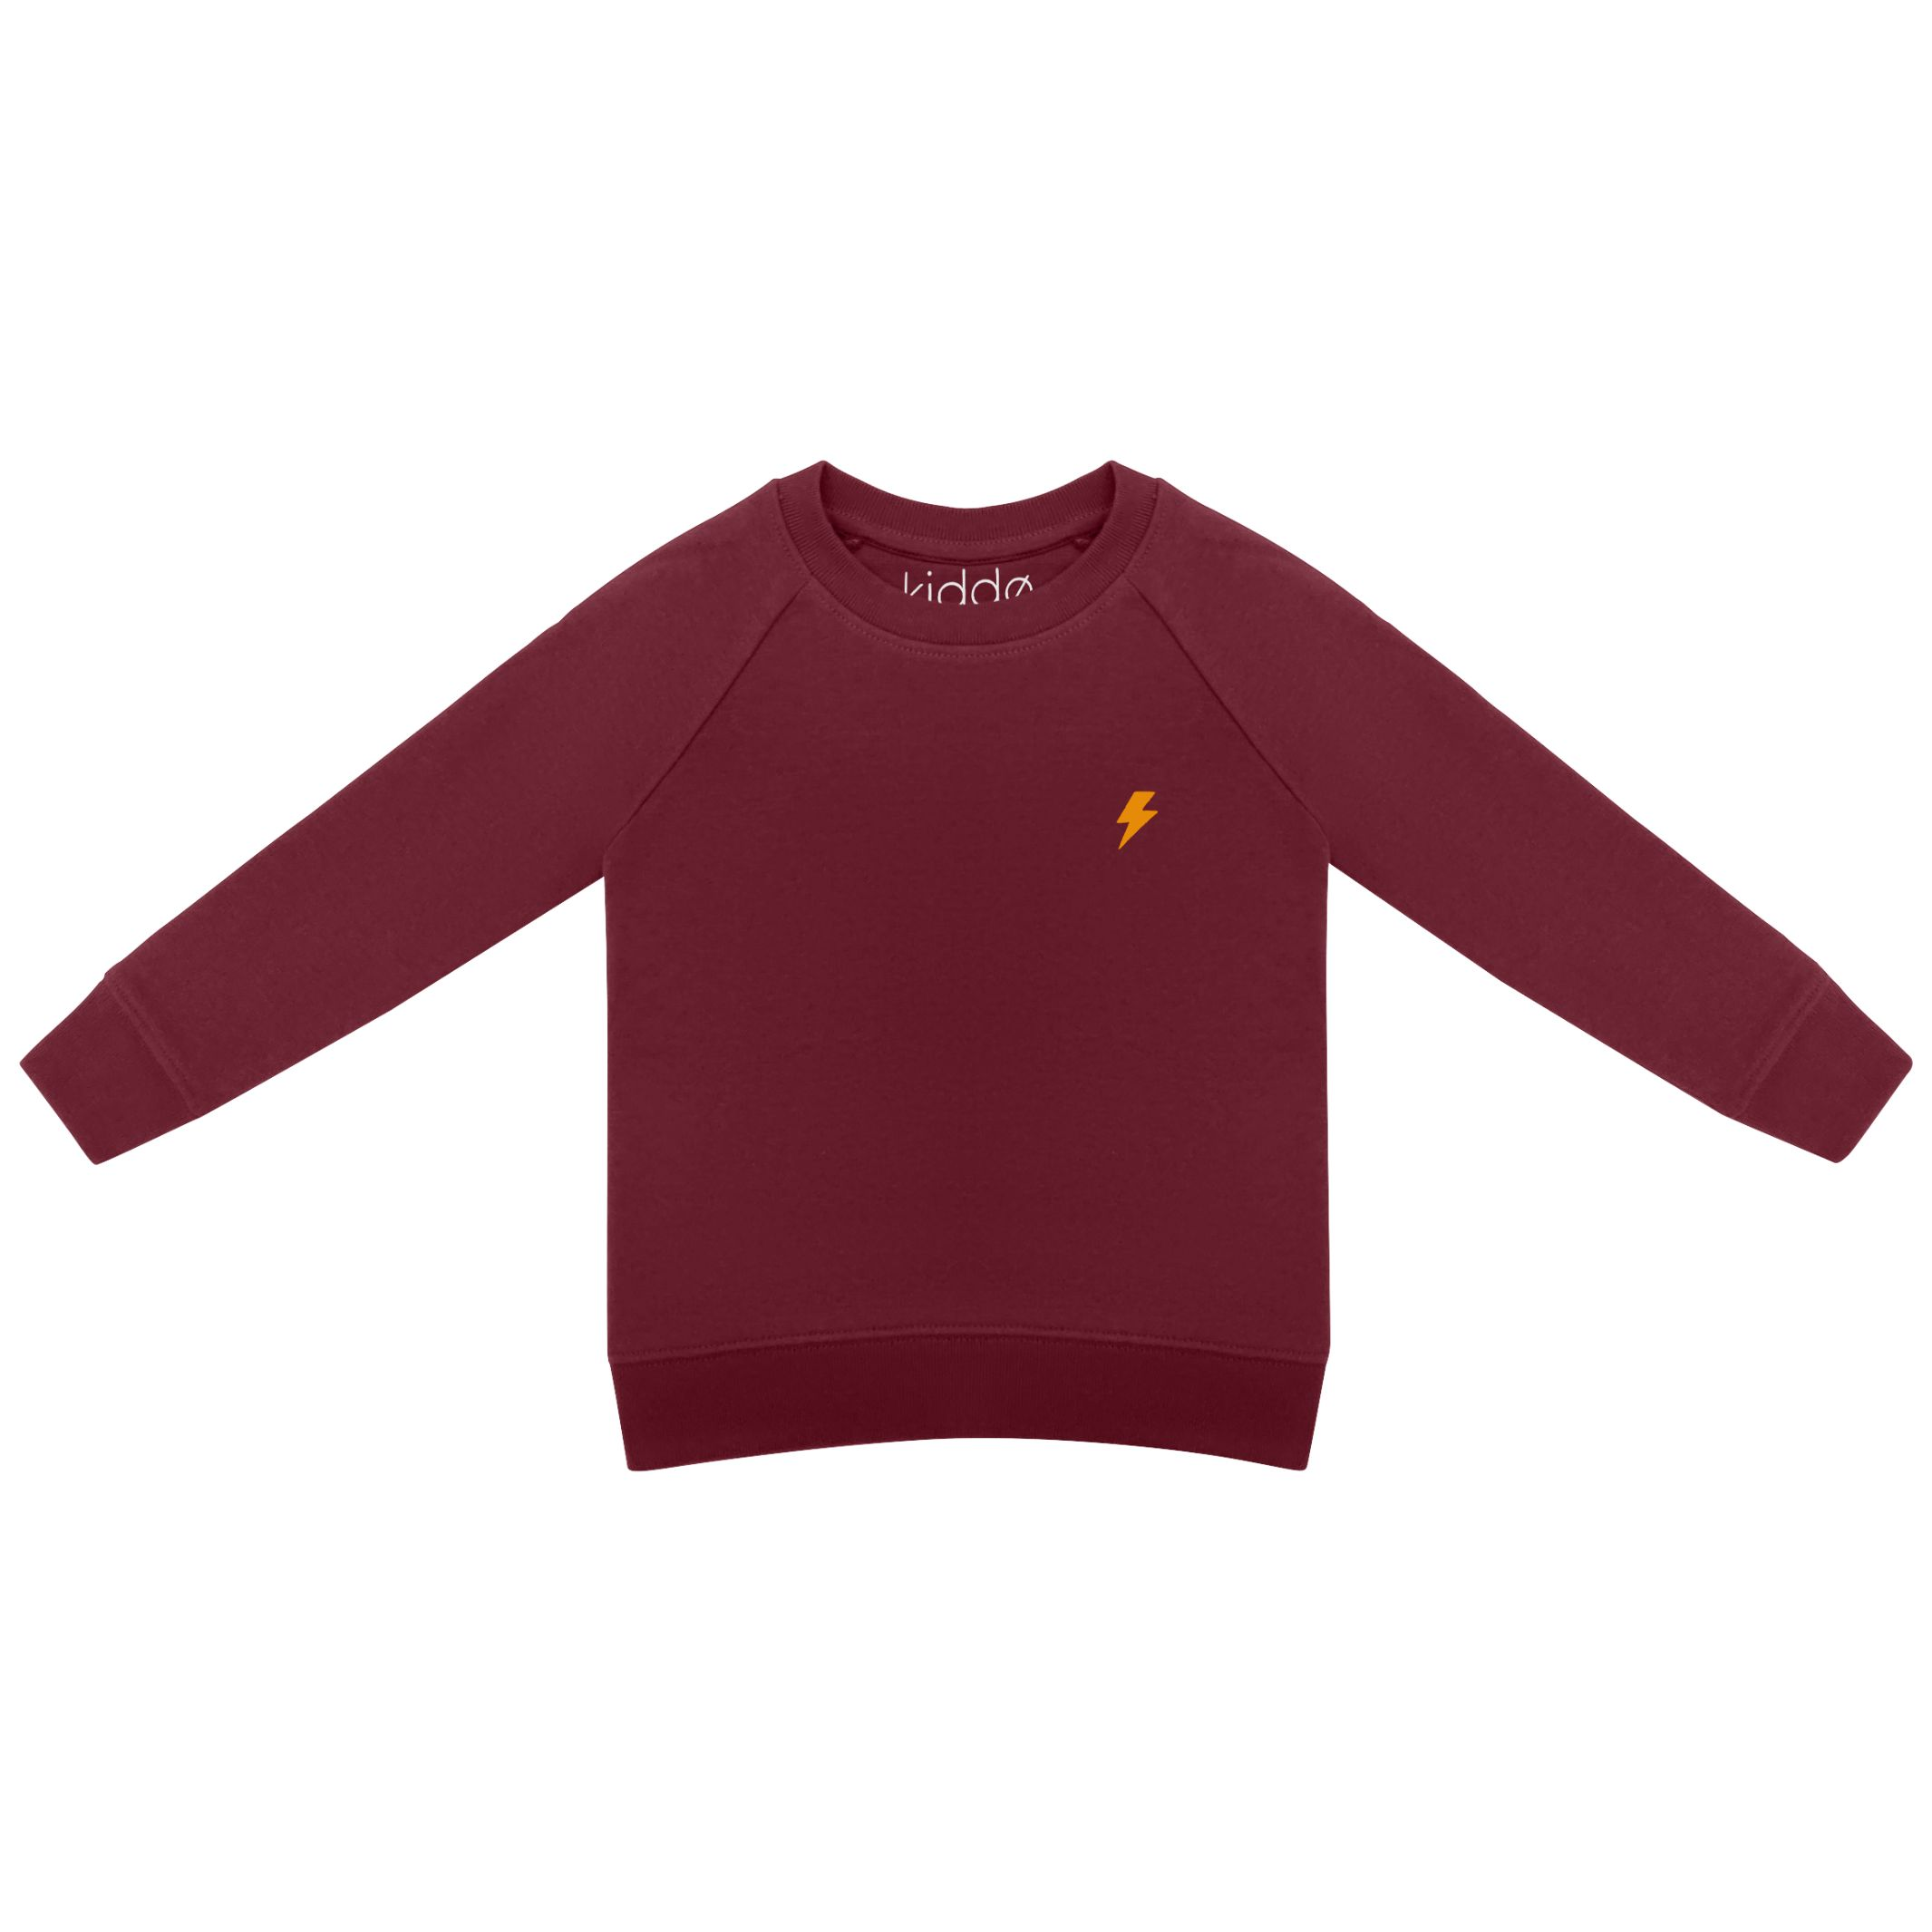 kiddø – lightning- sweater